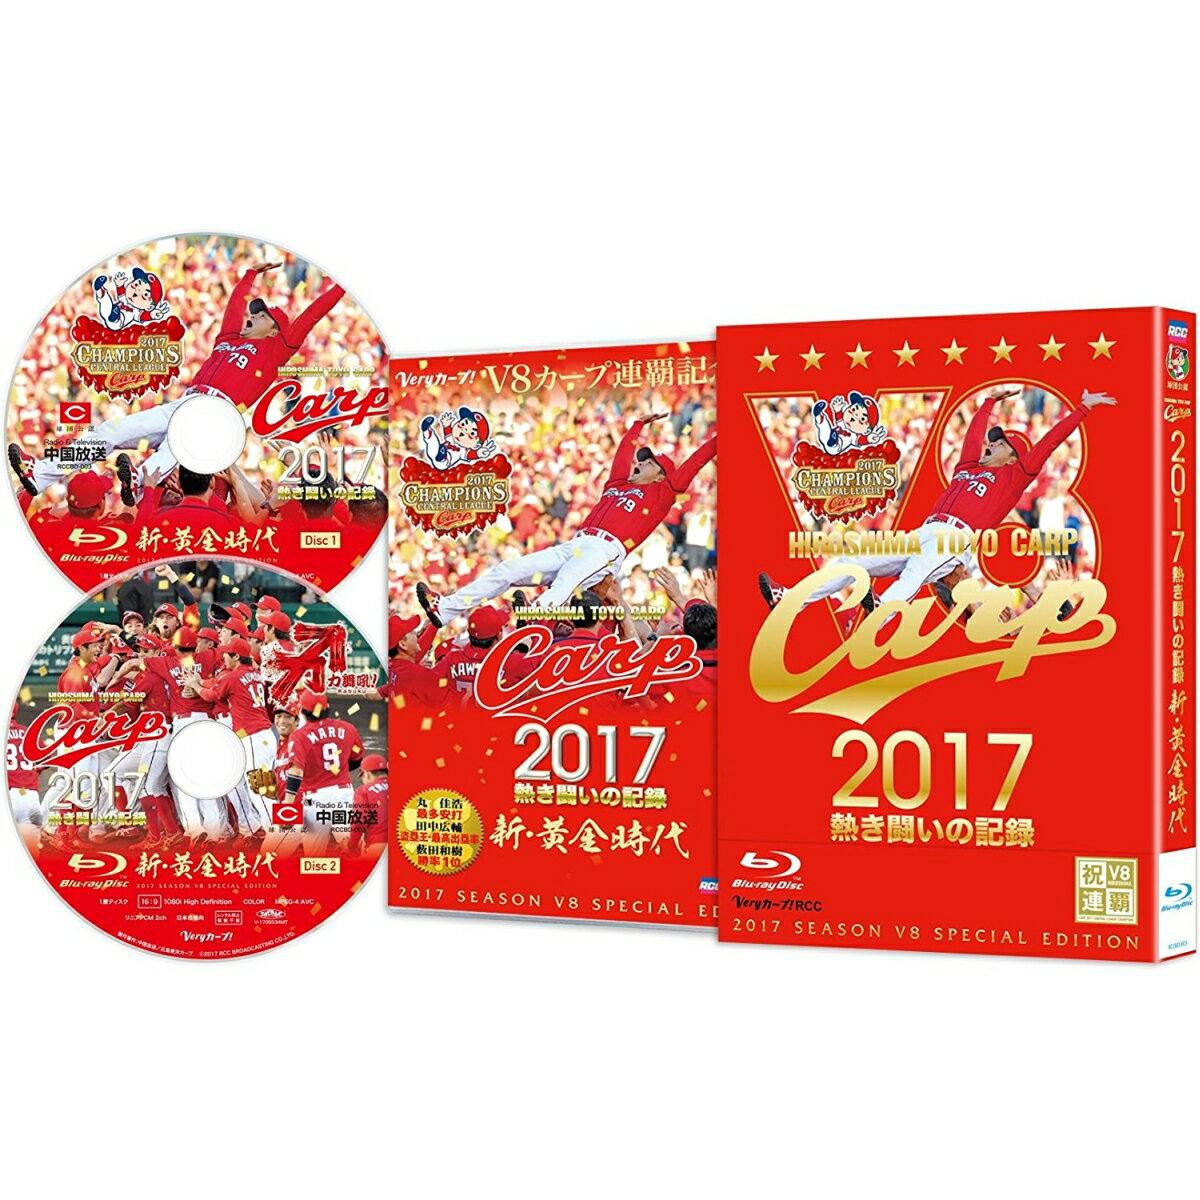 CARP2017熱き闘いの記録 V8特別記念版 〜新・黄金時代〜【Blu-ray】 [ (スポーツ) ]